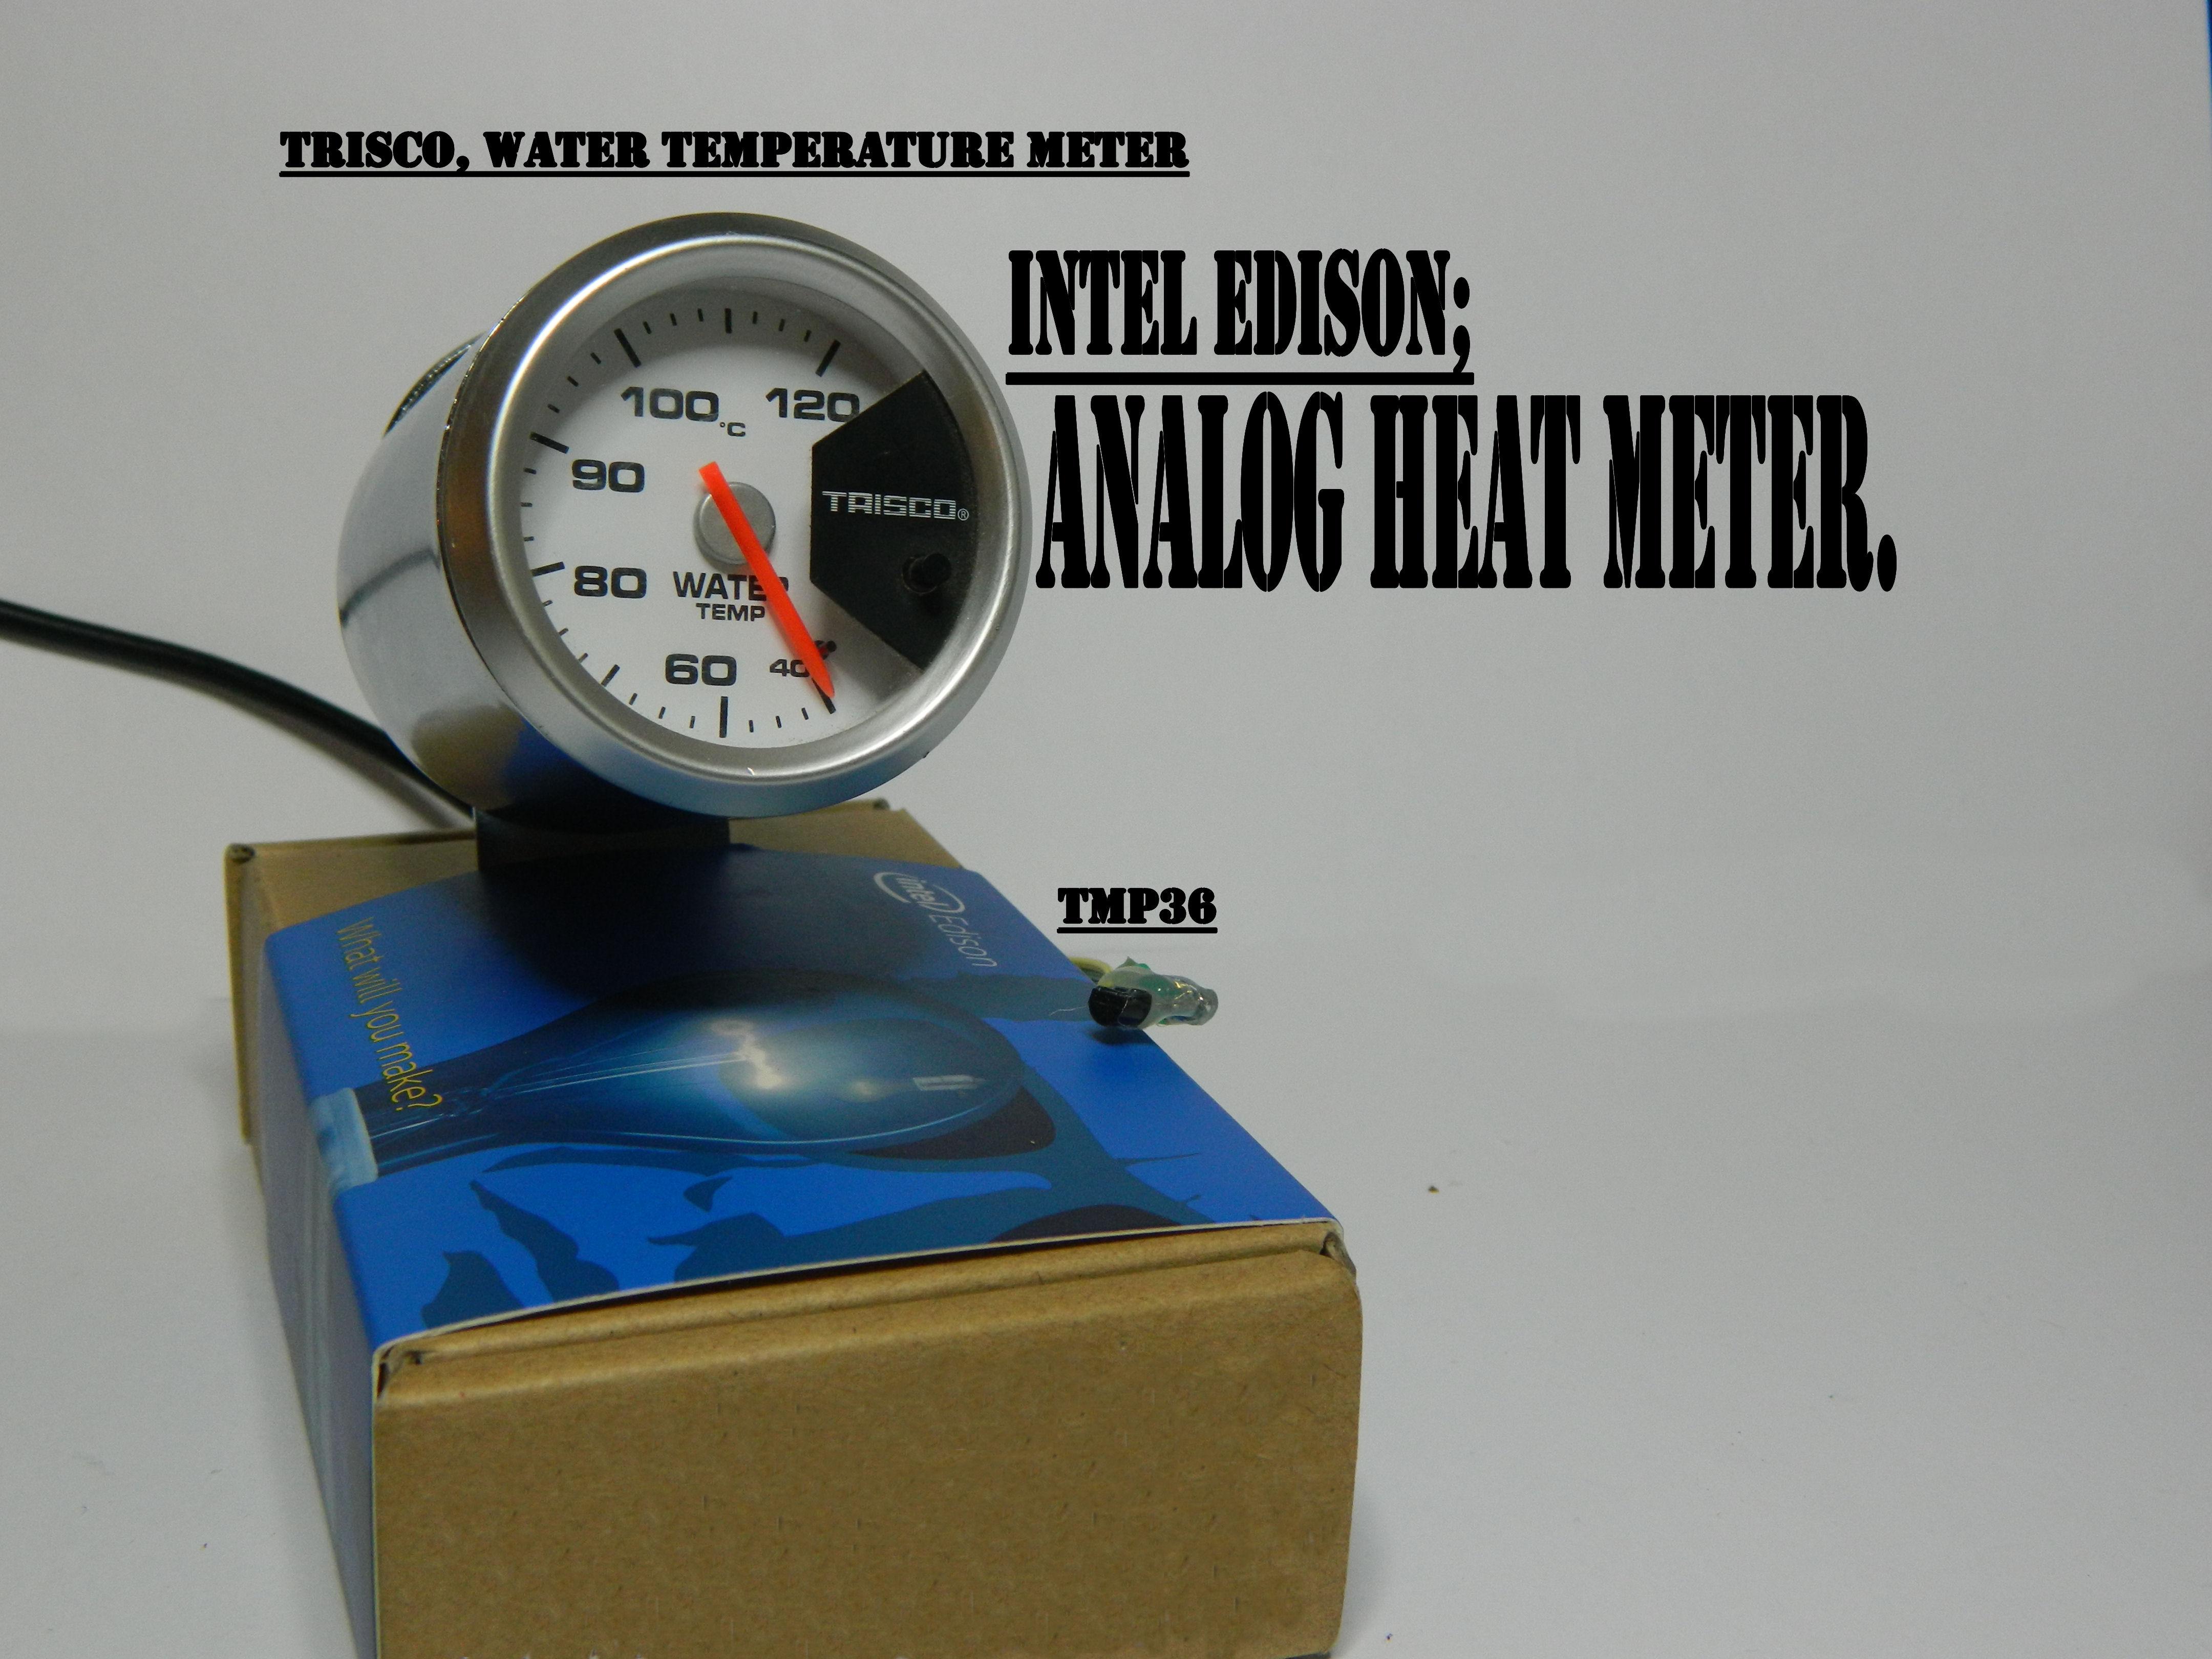 Picture of Intel Edison: Heat Meter, TMP36